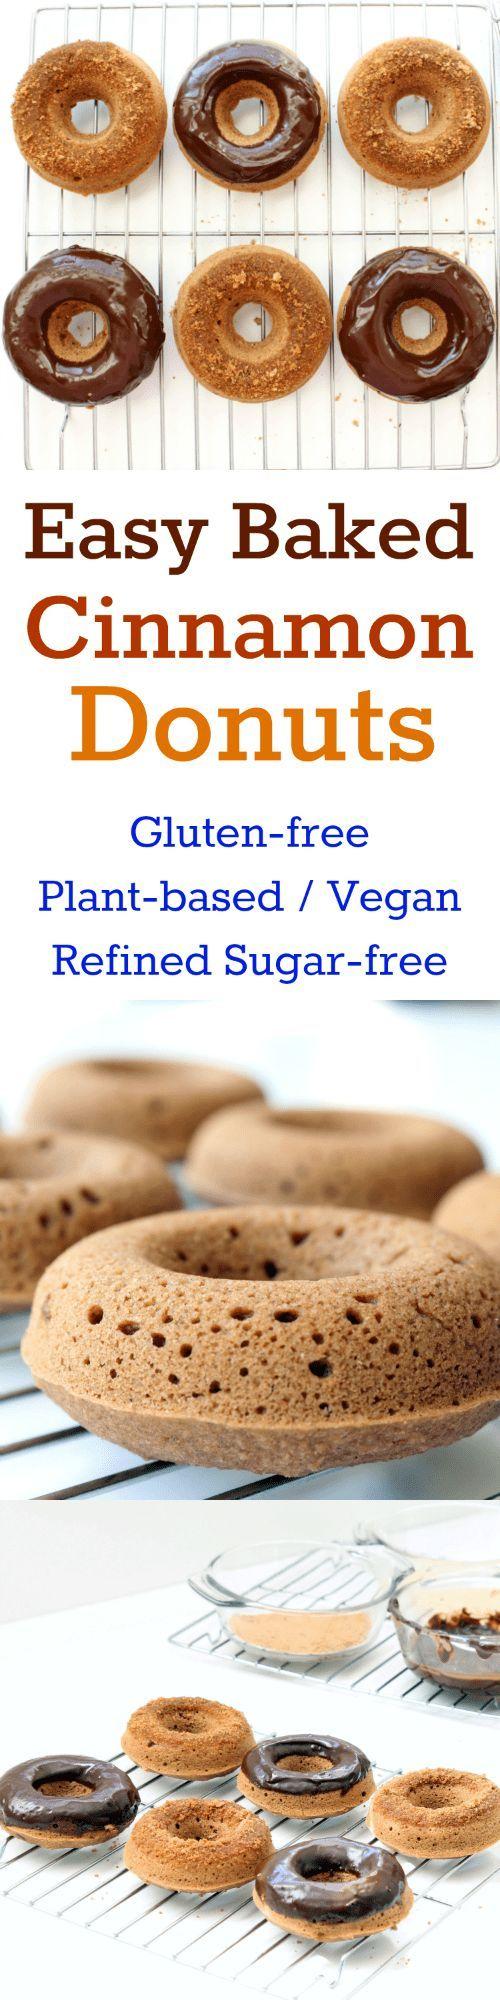 Easy Baked Cinnamon Donuts (Gluten-free, Plant-based / Vegan, Refined Sugar-free)